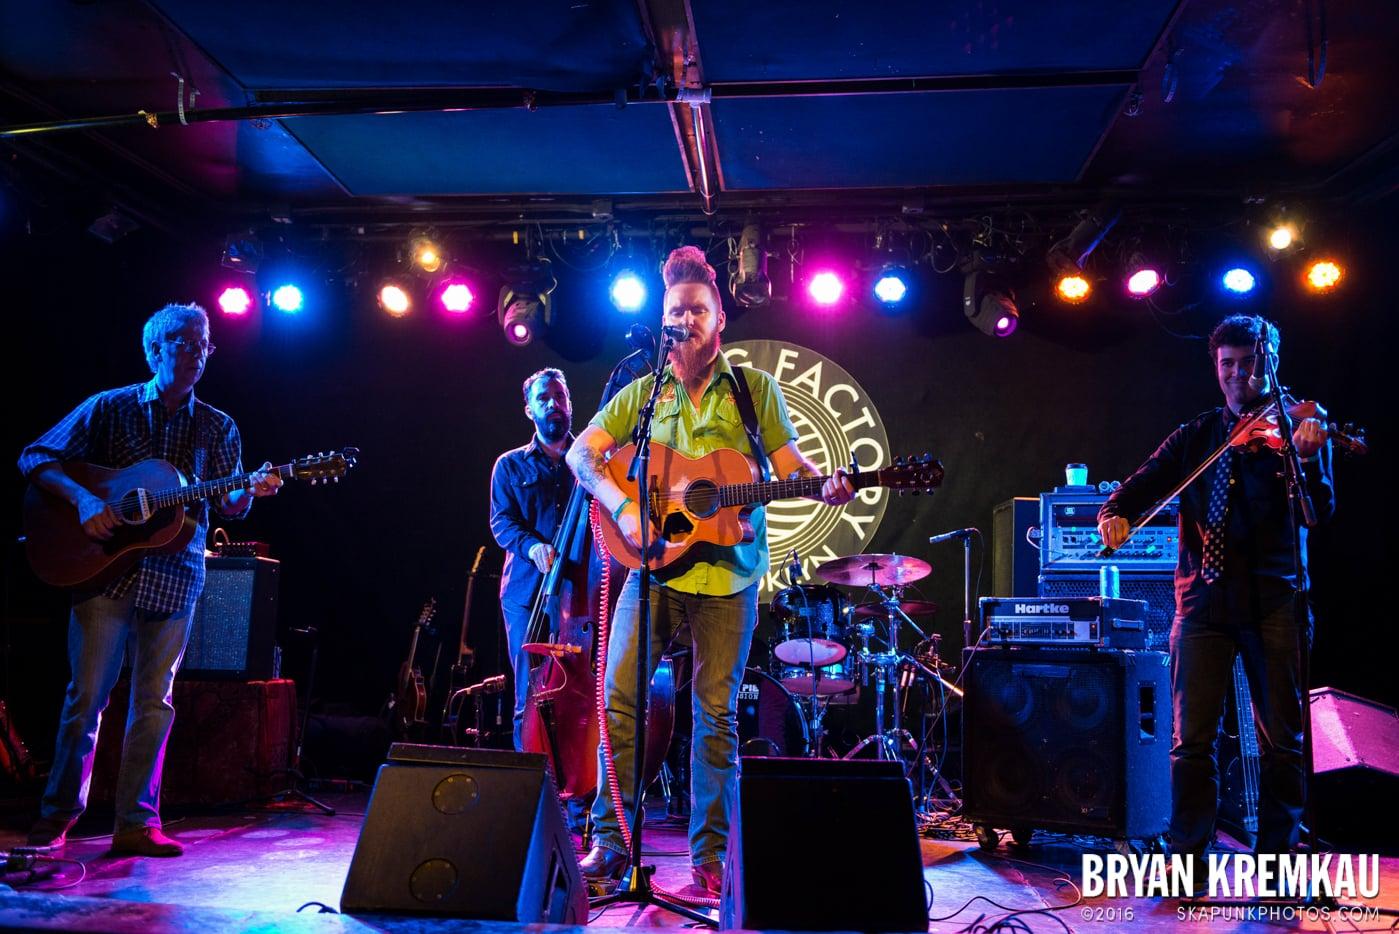 Danny Burns Band @ Knitting Factory, Brooklyn, NY - 9.10.14 (20)